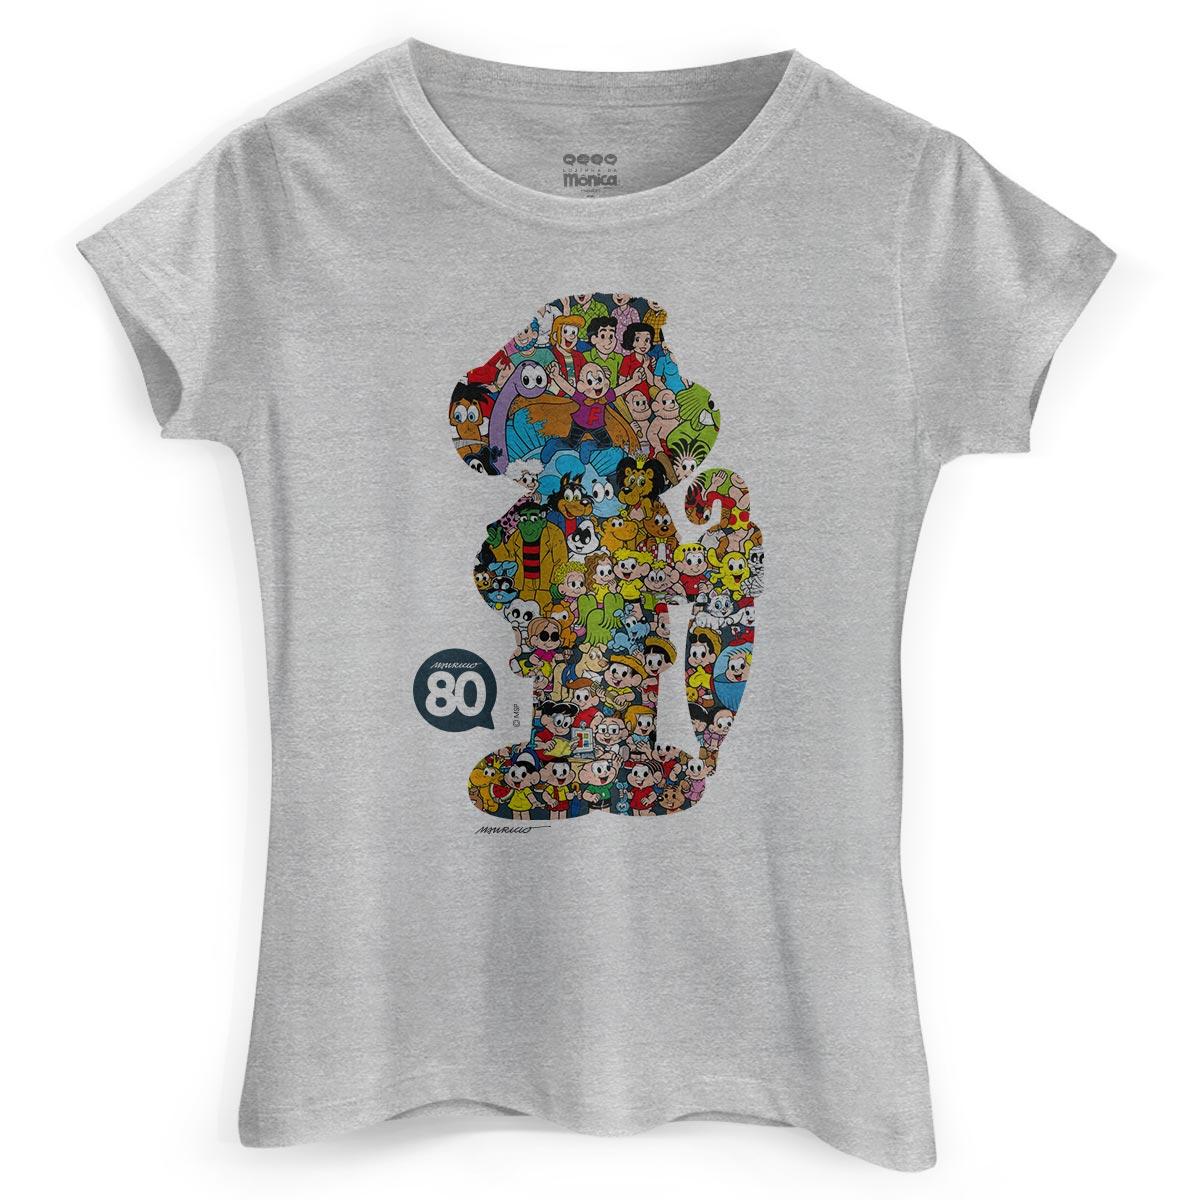 Camiseta Feminina Maur�cio de Sousa 80 Anos Casc�o